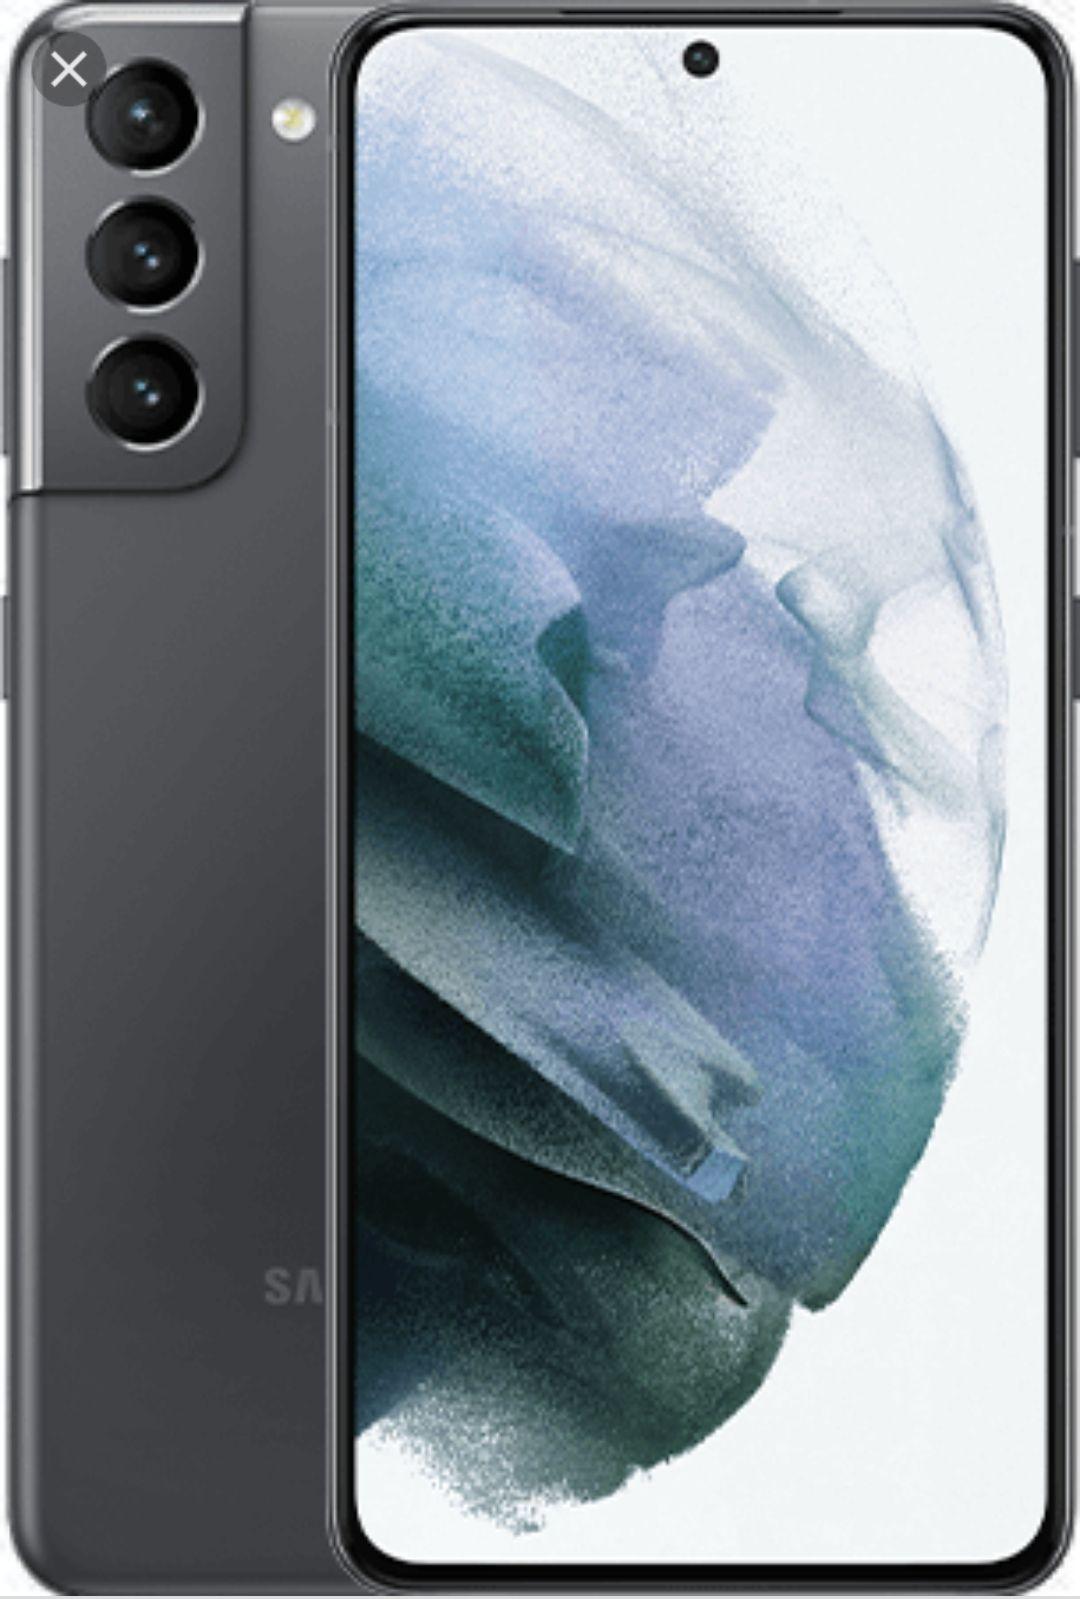 Samsung Galaxy S21 Snapdragon 888 128 GB 5G Dual SIM Grijs